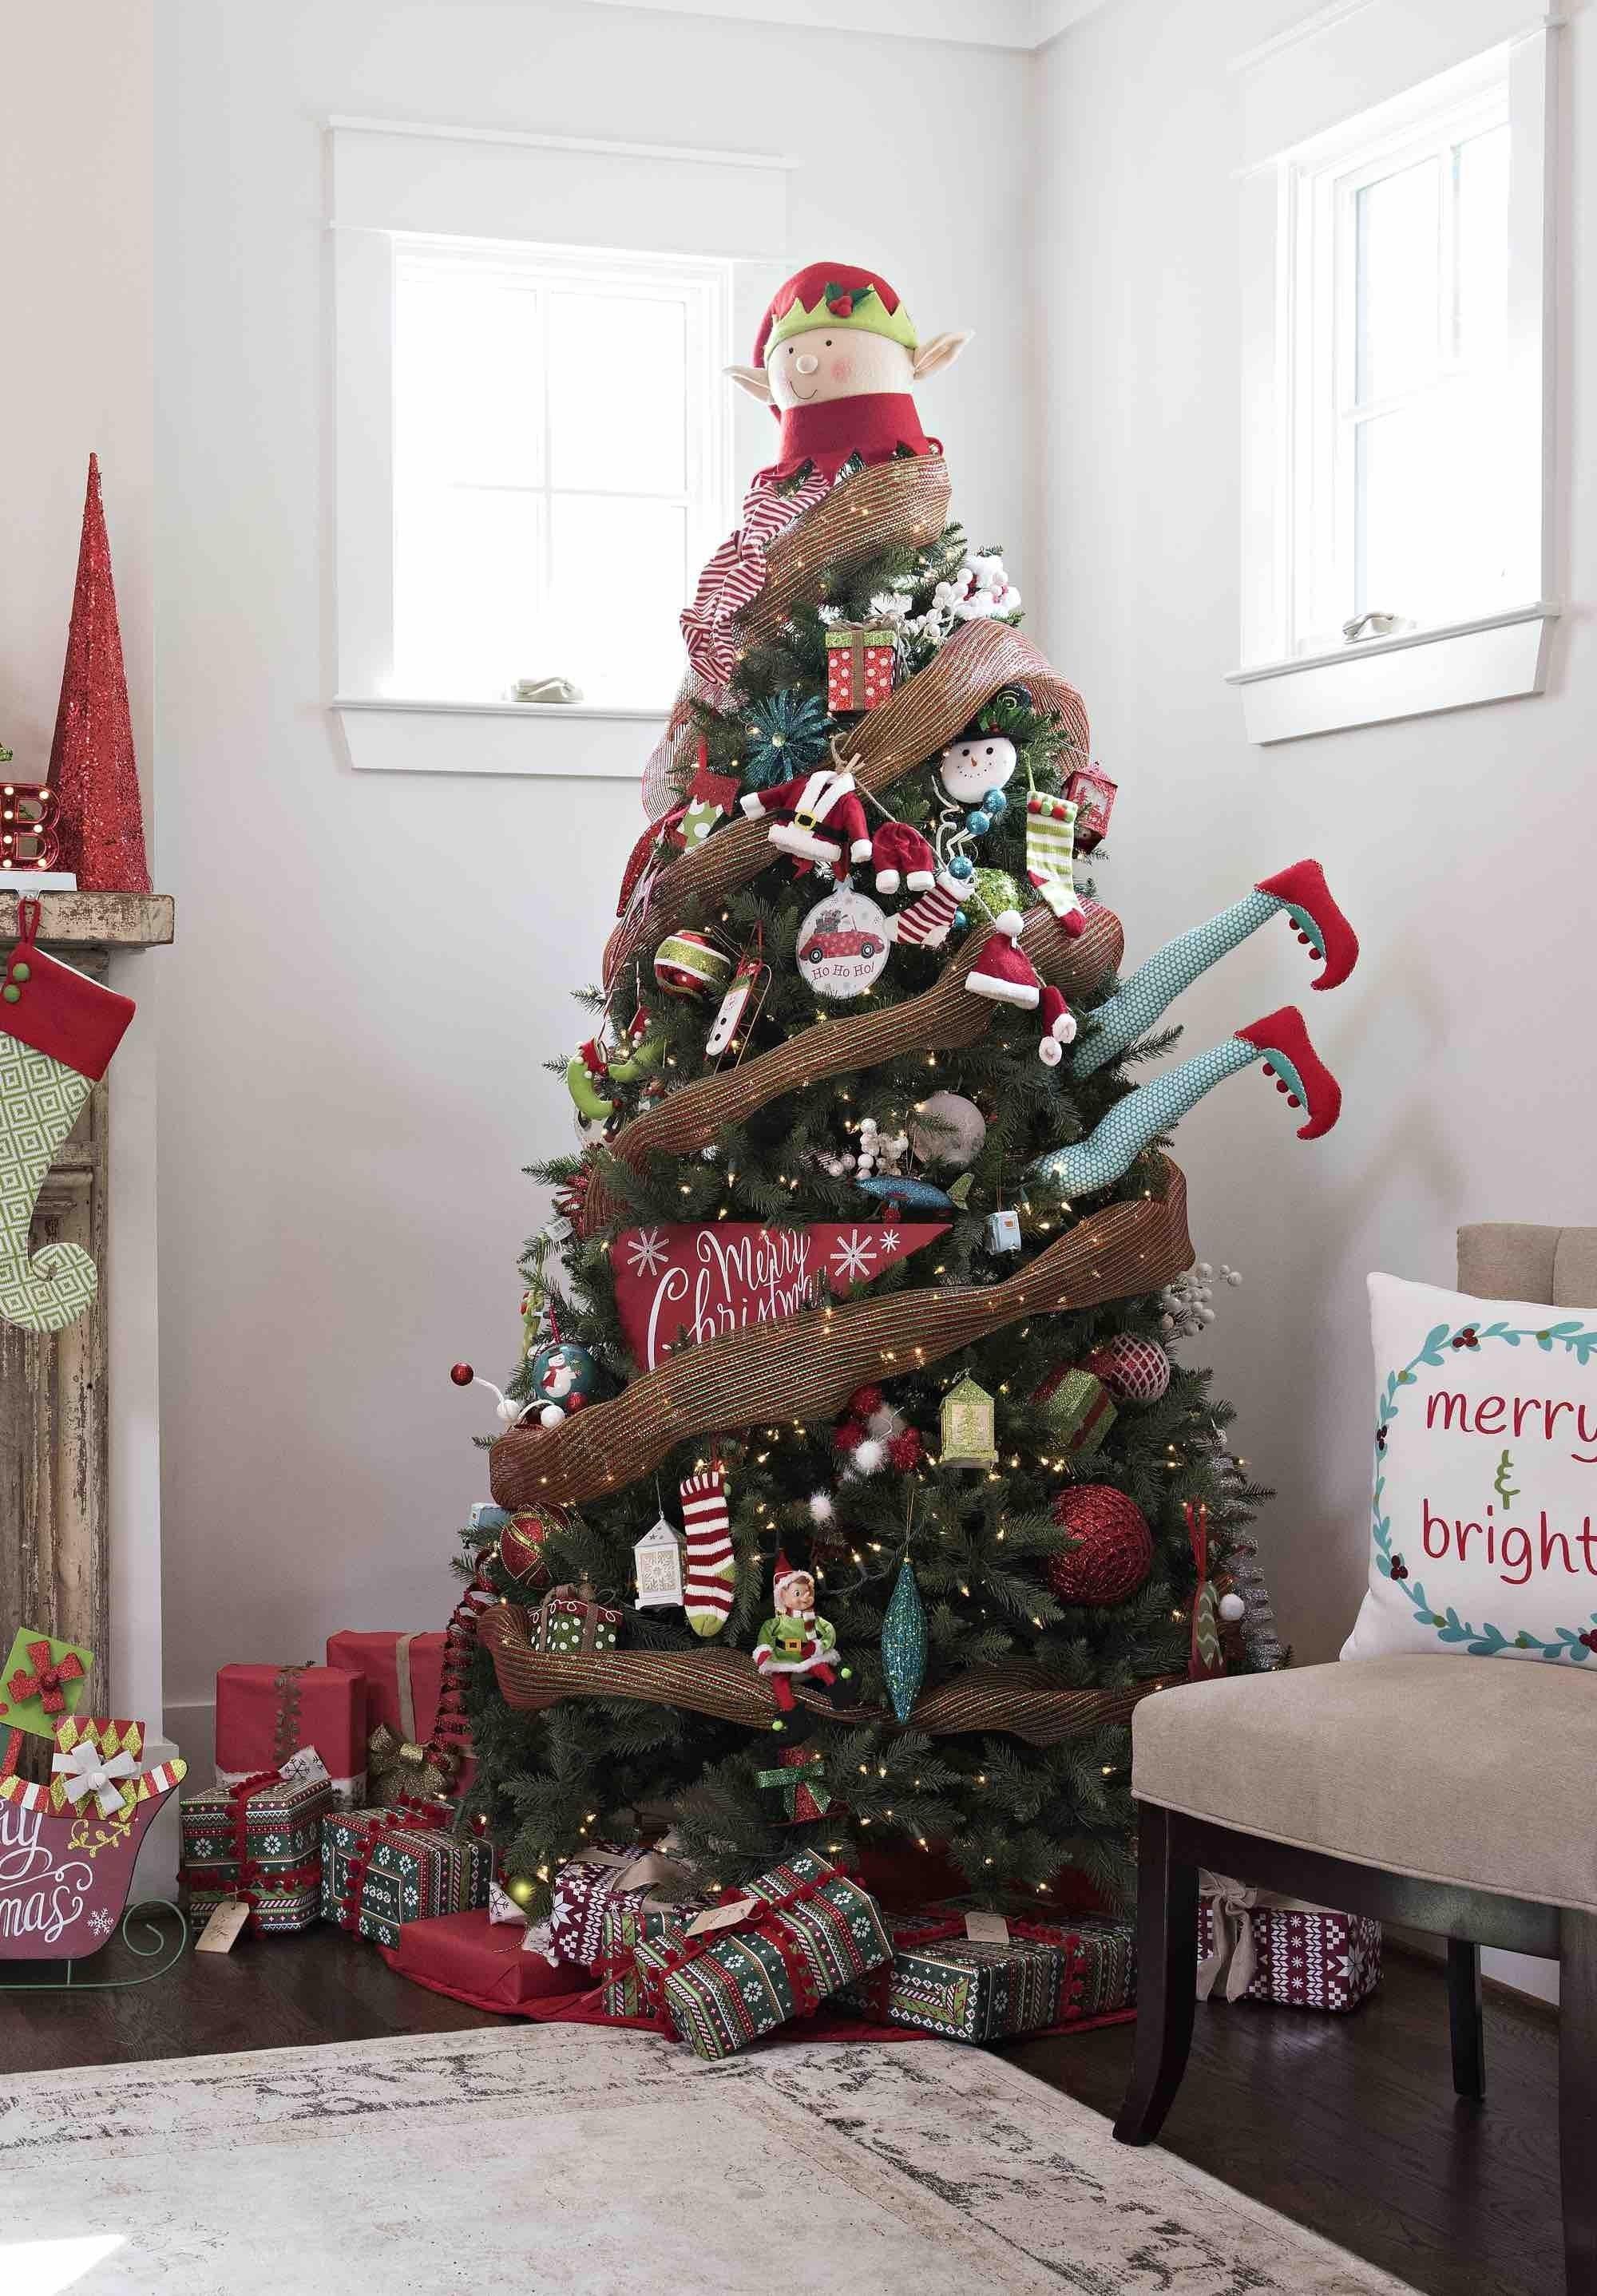 20 Wonderfull Unique Christmas Decorations Kirkland following site ...